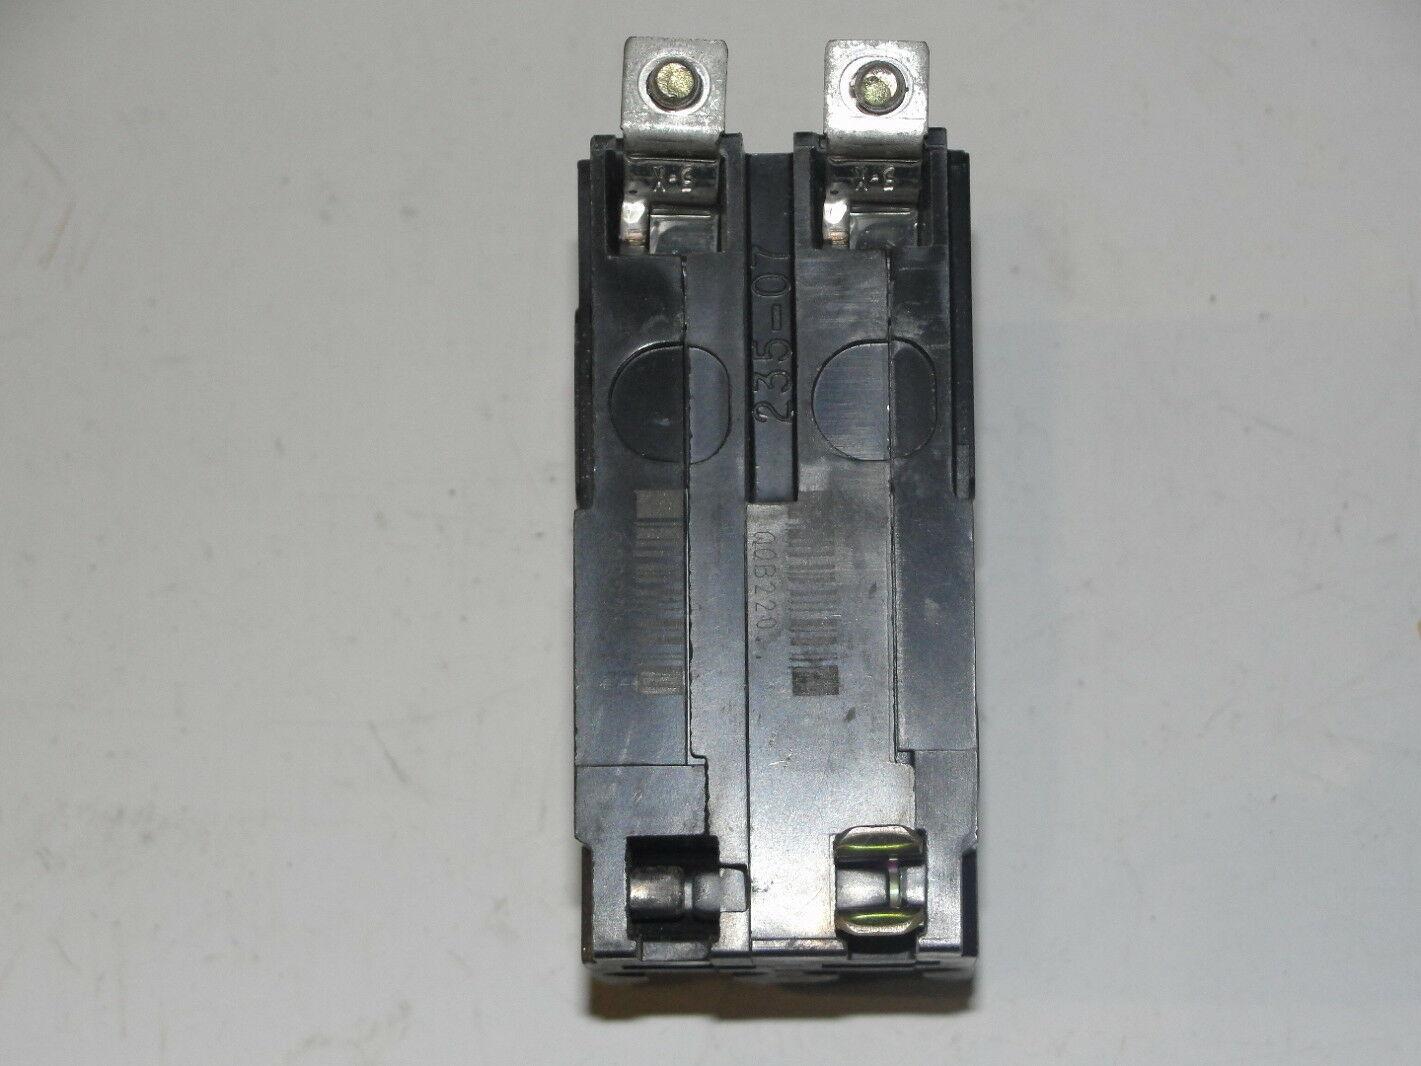 Qo Circuit Breaker Square D 15a 1p Rona 20a 2 Pole Bolt On